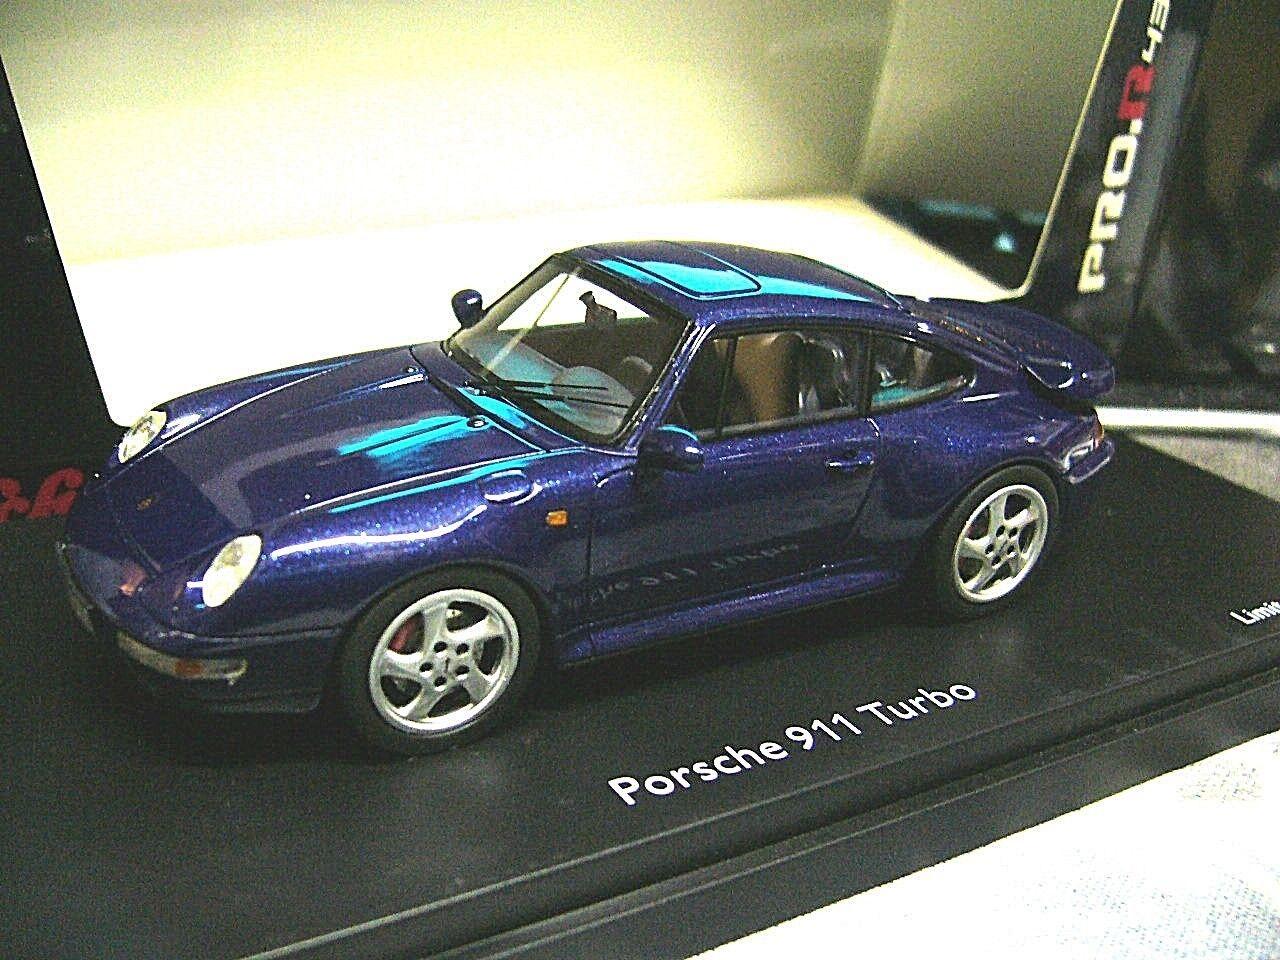 Porsche 911 Turbo 993 1995 bleu Bleu Resin highenddetail SCHUCO PRO R résidus 1 43